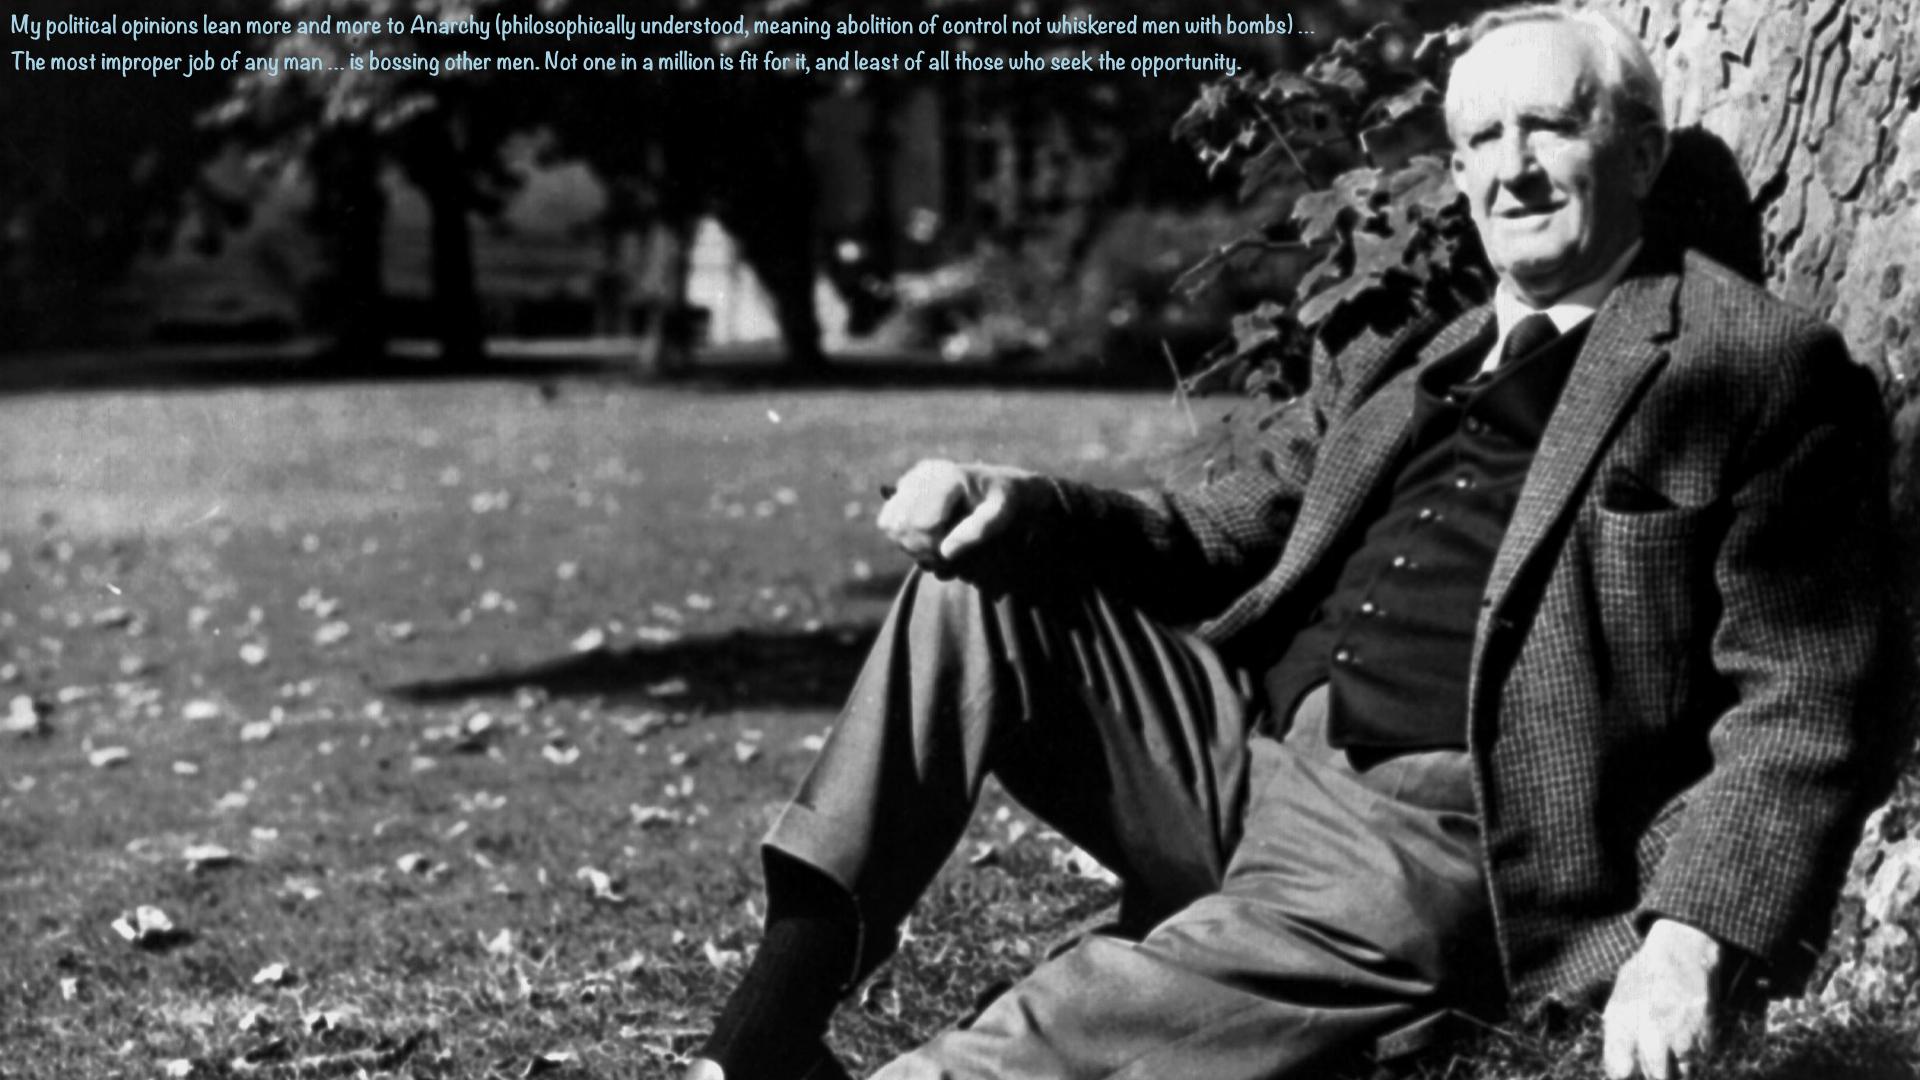 JRR Tolkien 1920 1920x1080